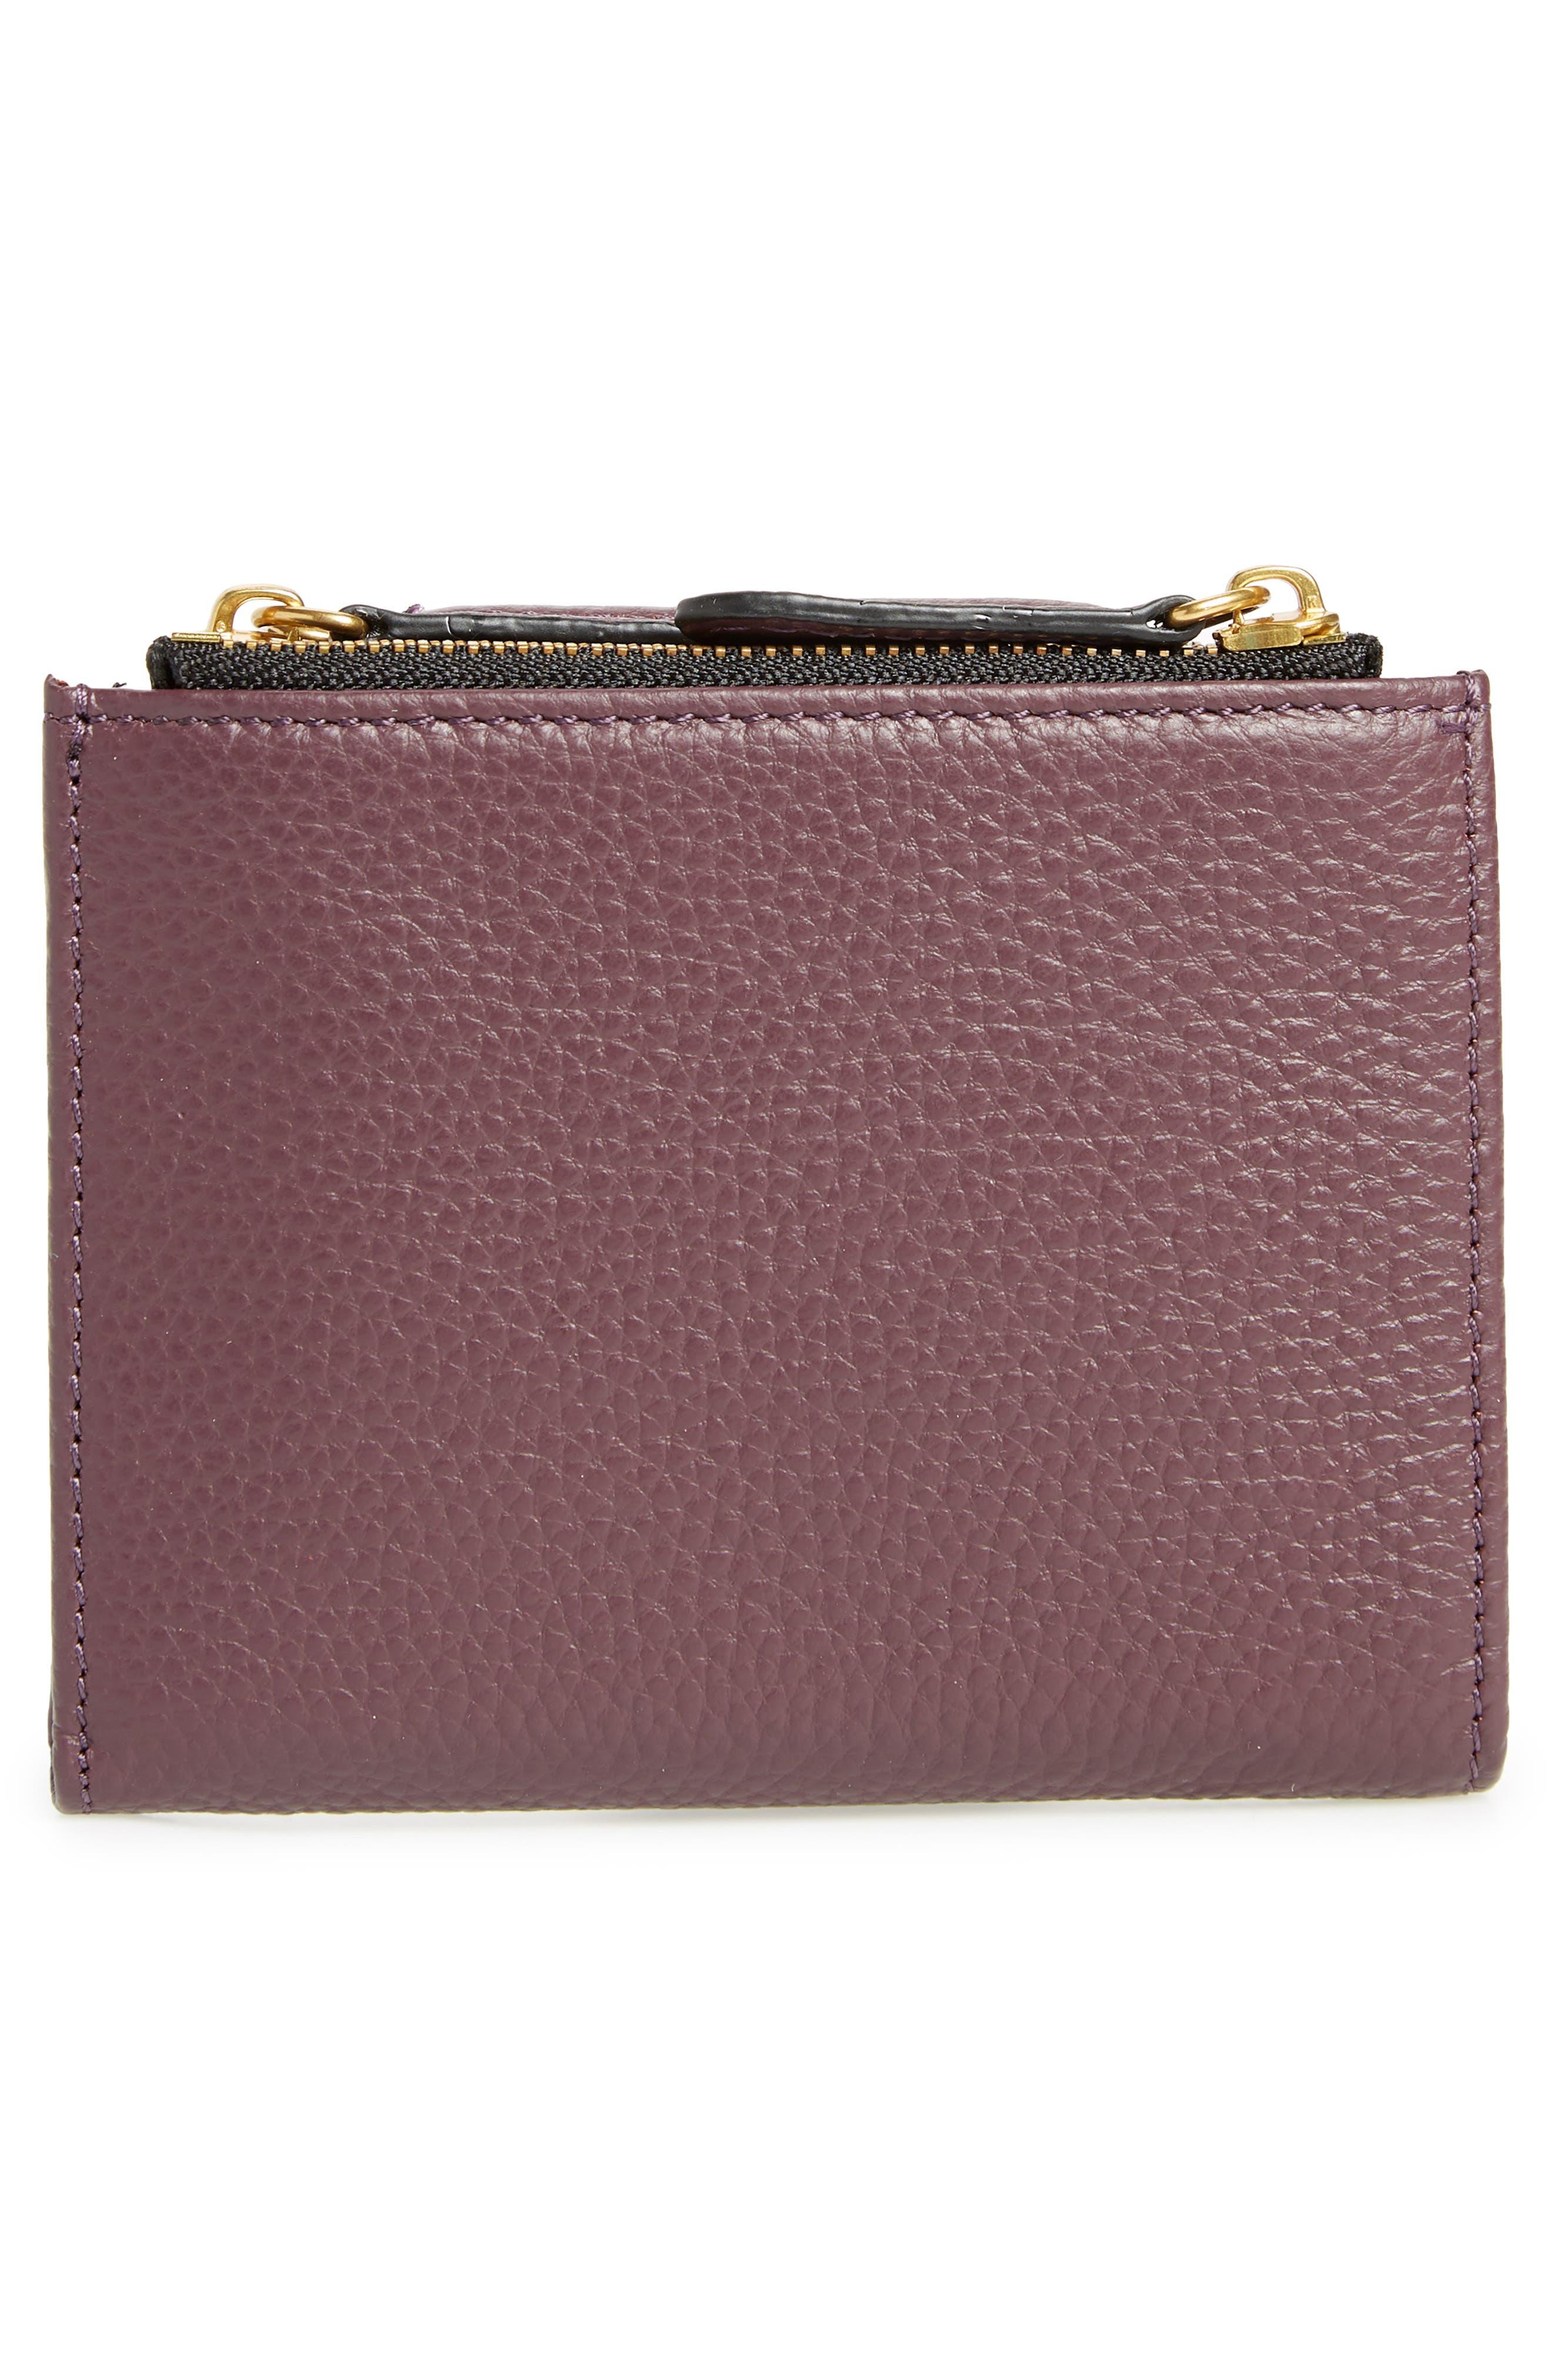 E Leather Wallet,                             Alternate thumbnail 16, color,